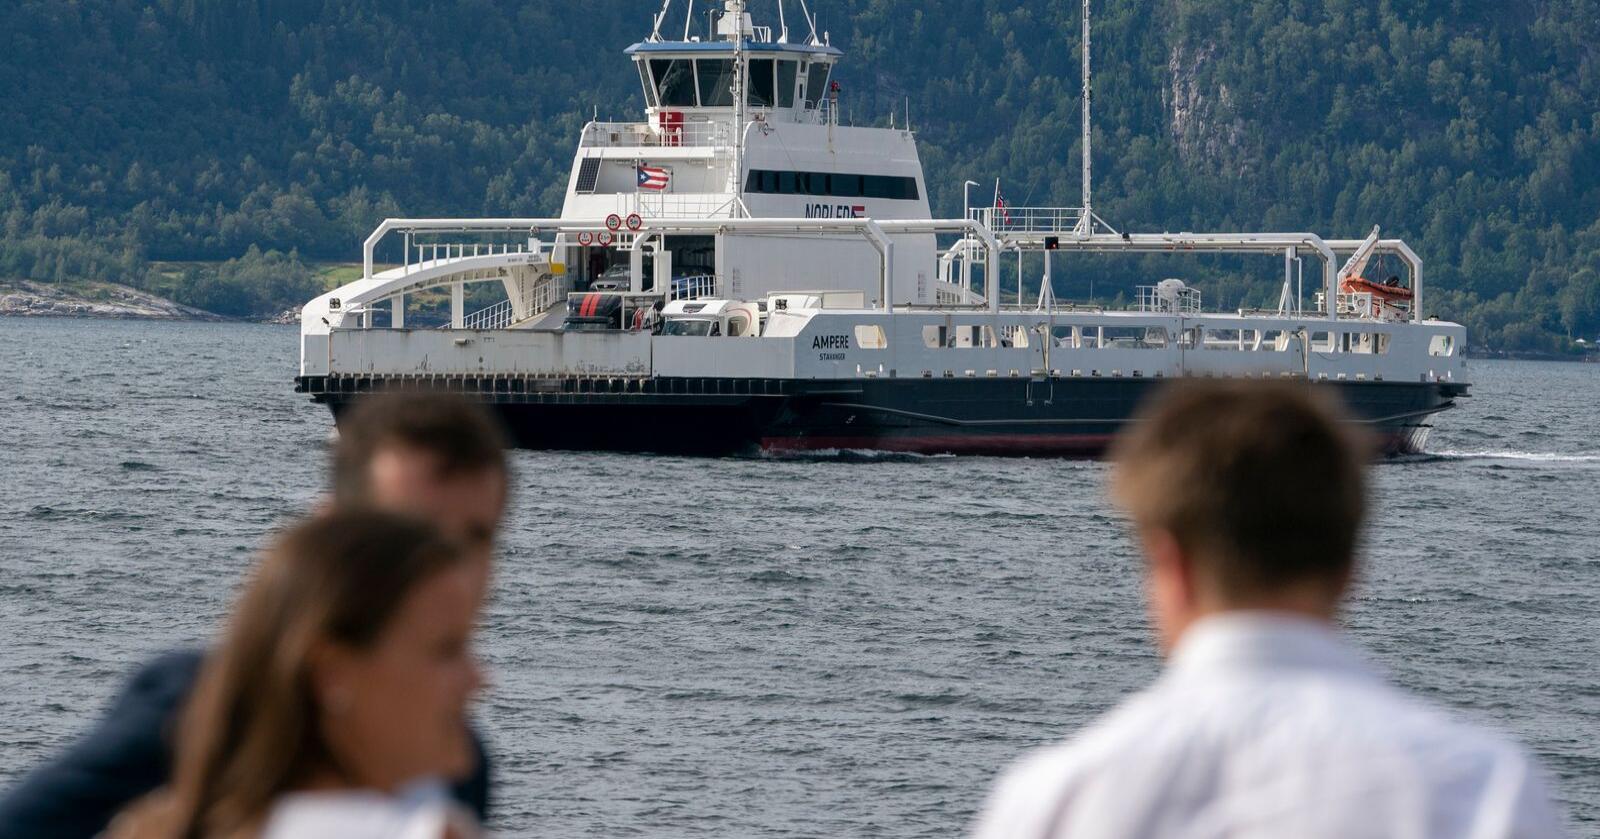 El-ferja Ampere i Sognefjorden. I flere kystfylker har det den siste tiden vært heftige protester mot økte ferjepriser fra nyttår. Et viktig element i debatten har vært overgangen til el- og lavutslippsferjer. Foto: Heiko Junge / NTB scanpix